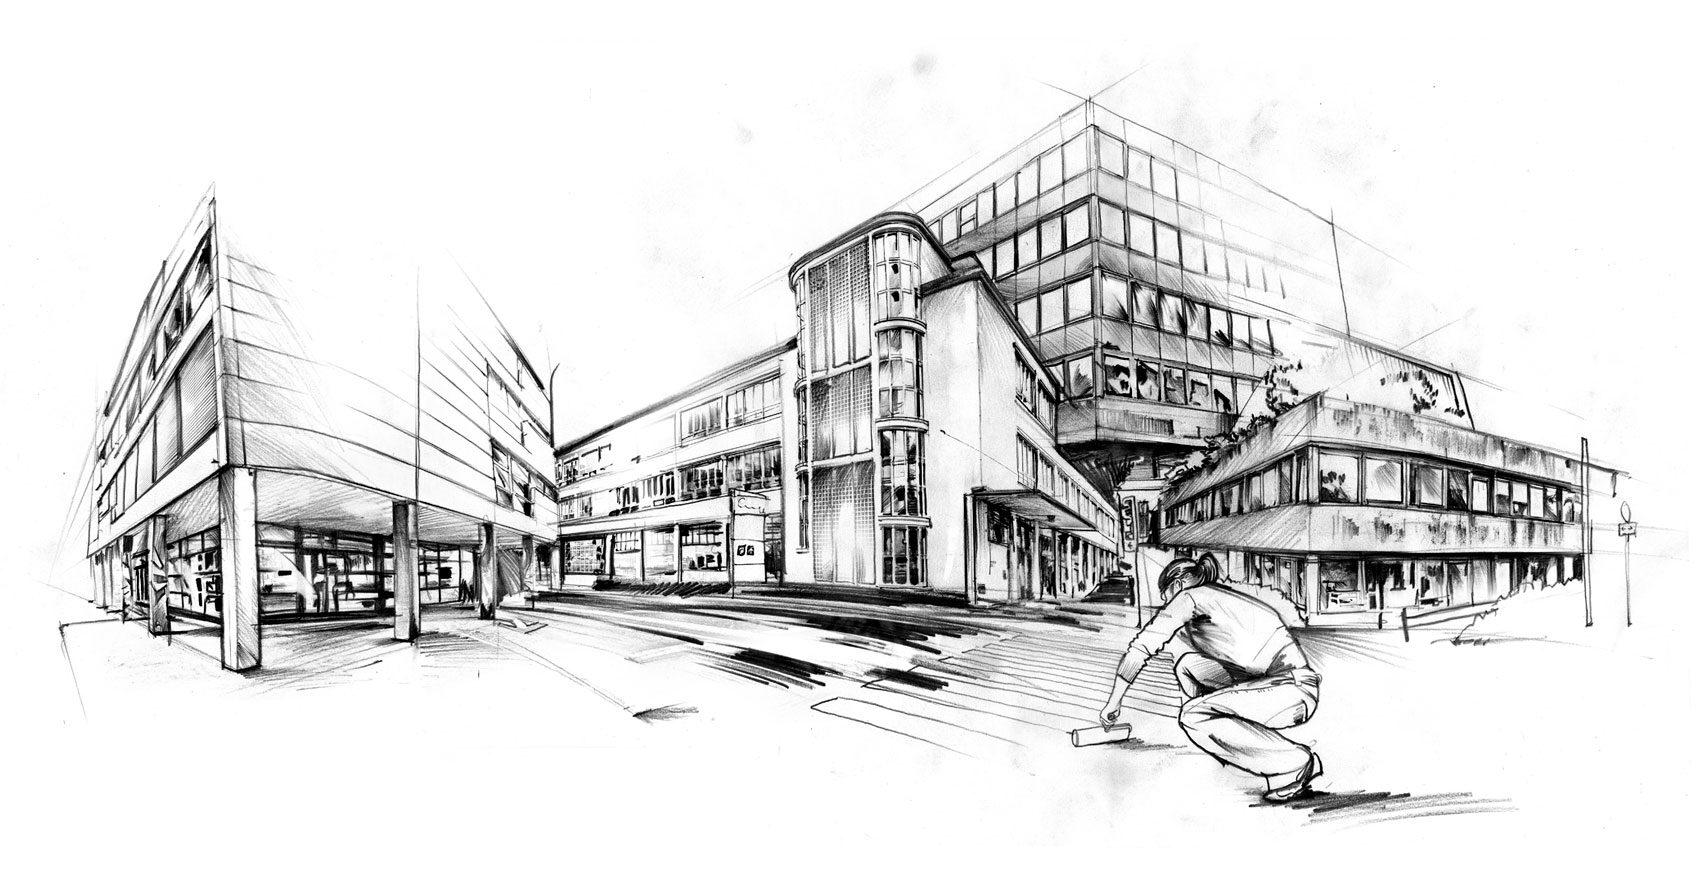 Sfgb - Kornel Illustration | Kornel Stadler portfolio